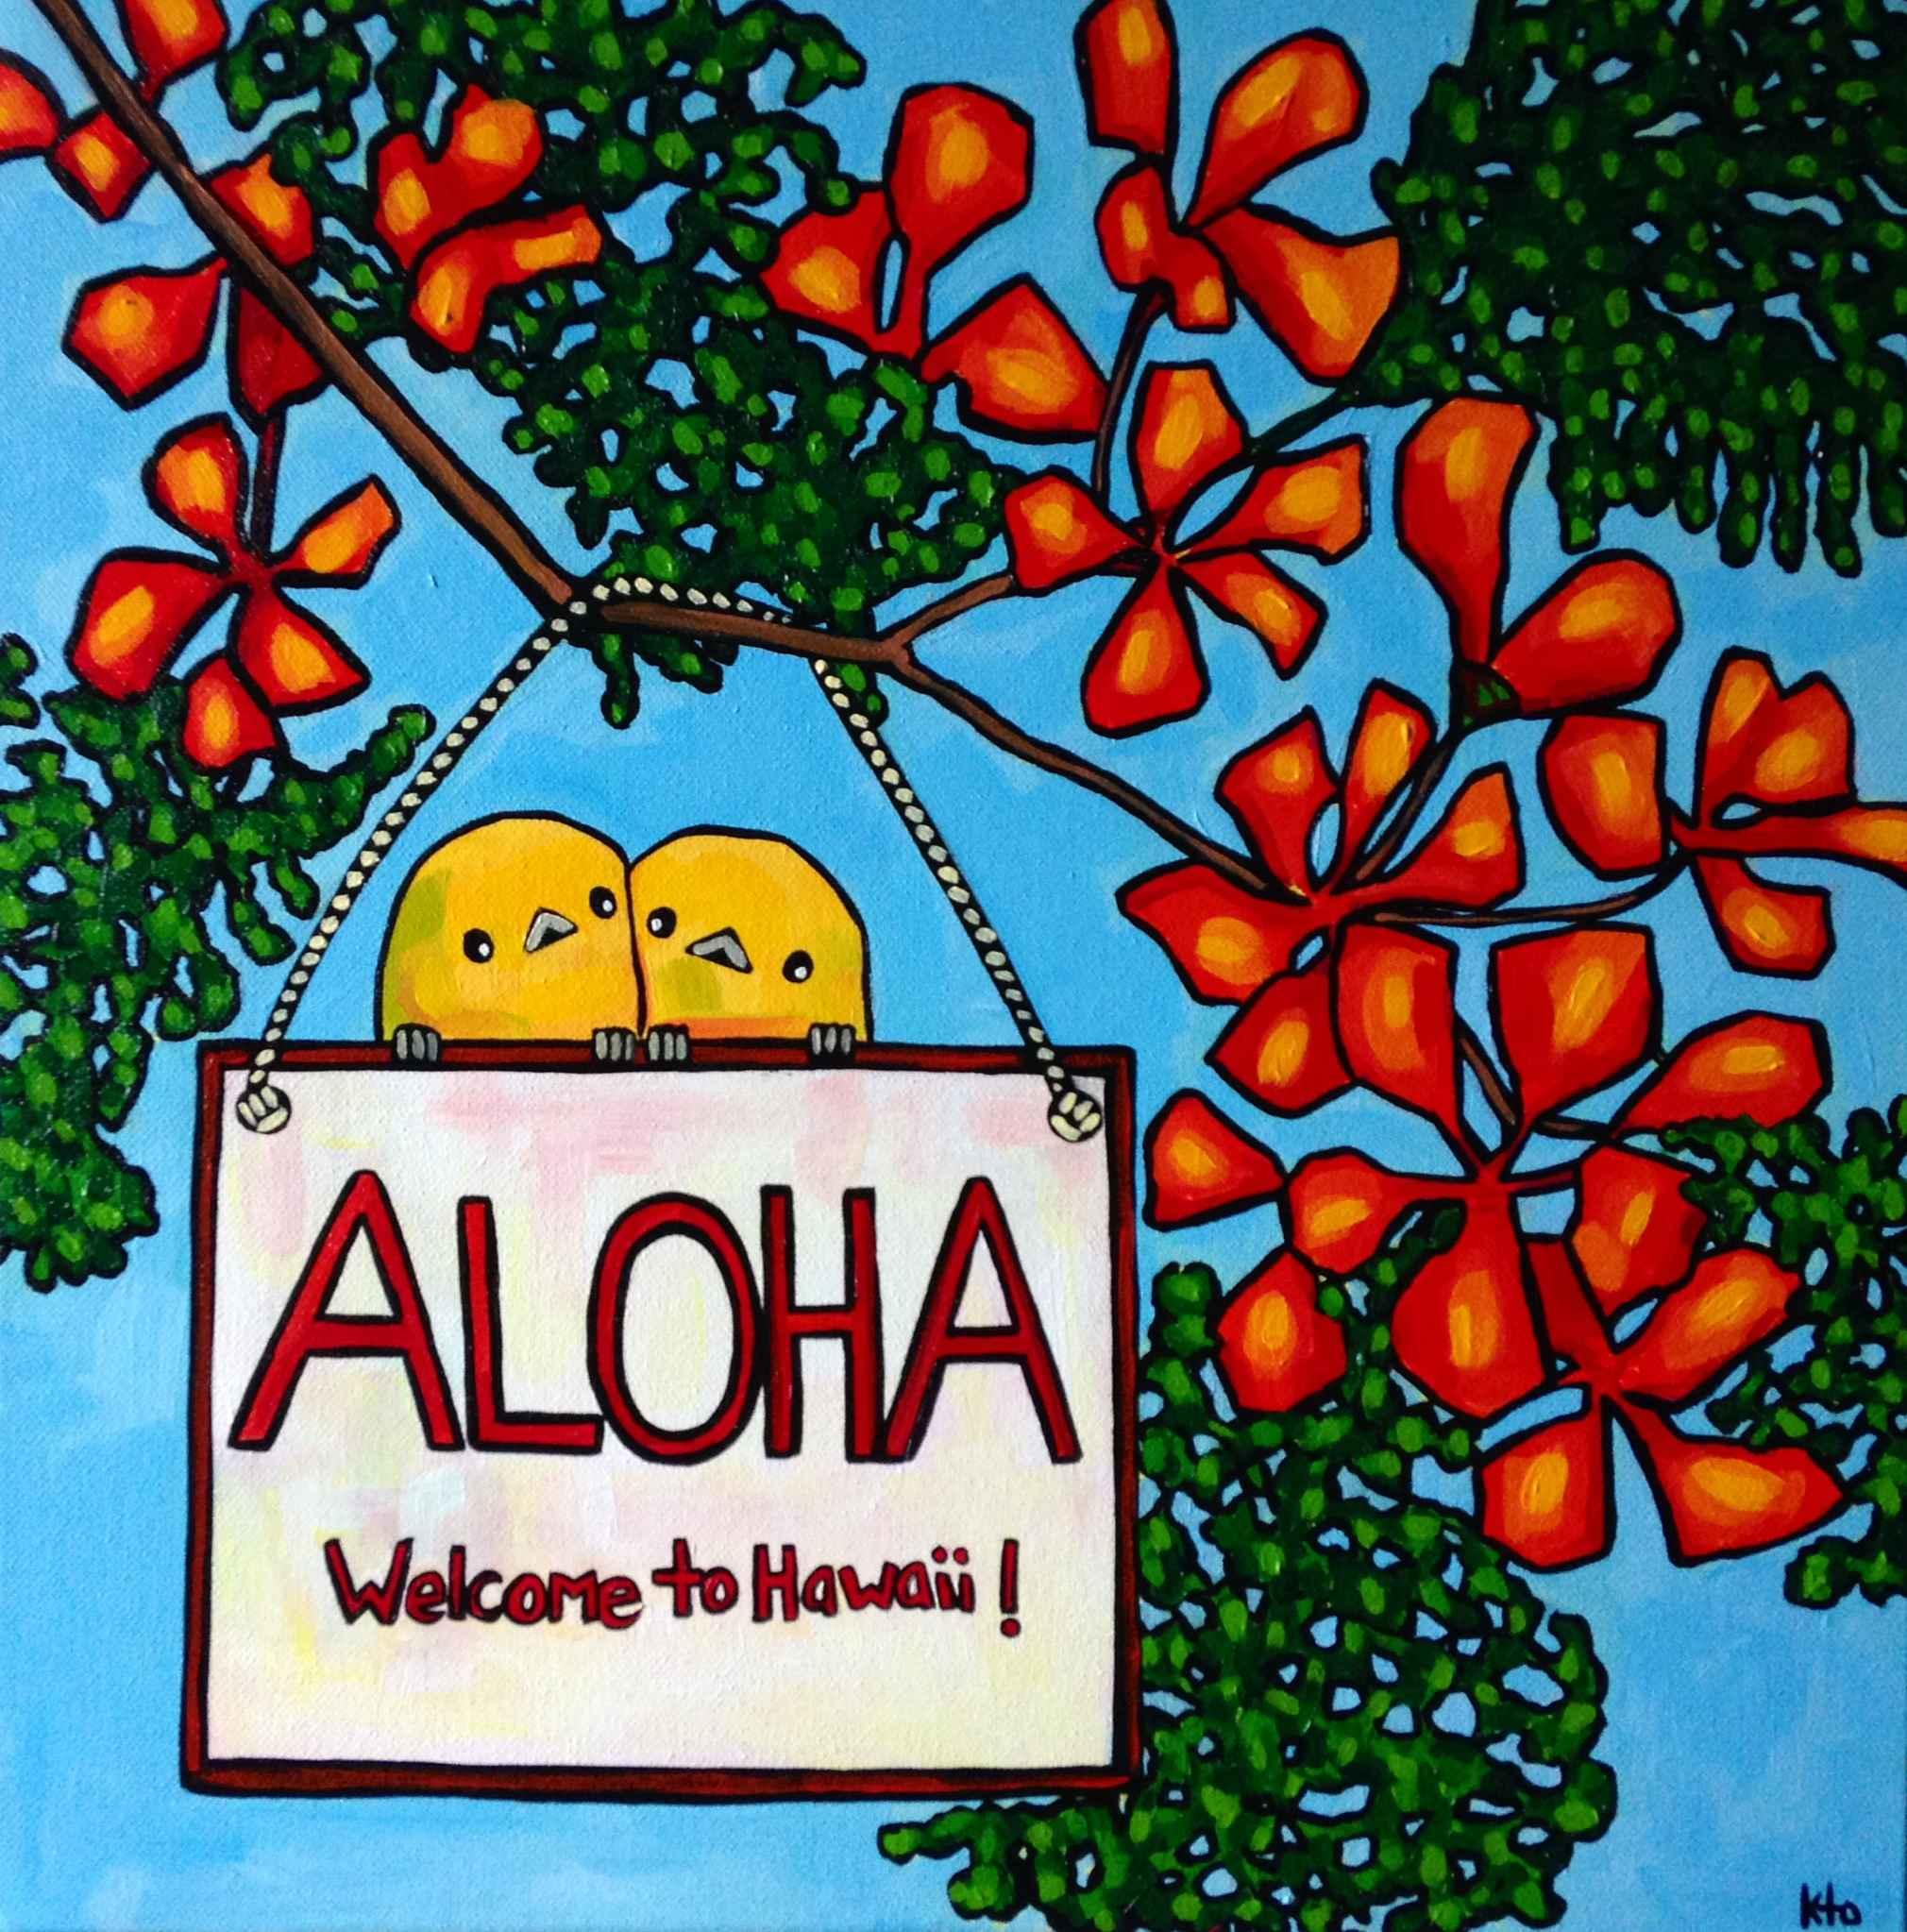 KTO Aloha Welcome to ... by   KTO - Masterpiece Online